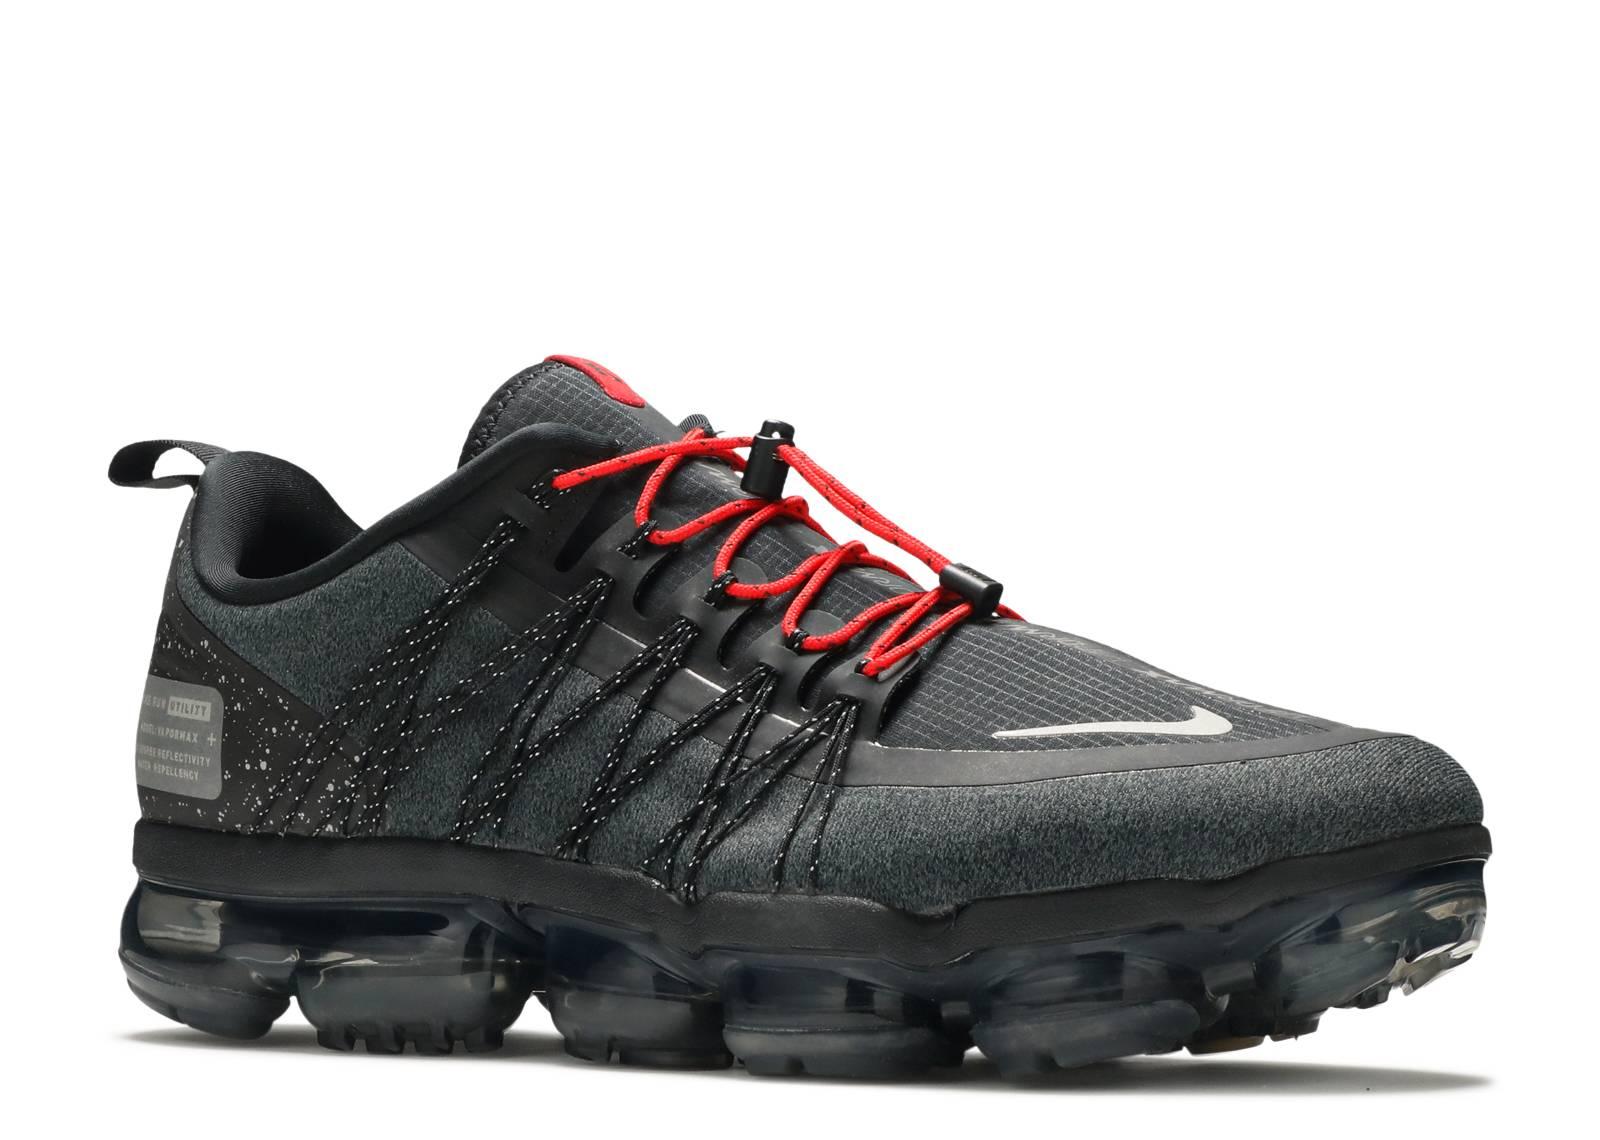 052324d5616a8 Nike Air Vapormax Run Utility - Nike - aq8810 001 - black reflect sliver